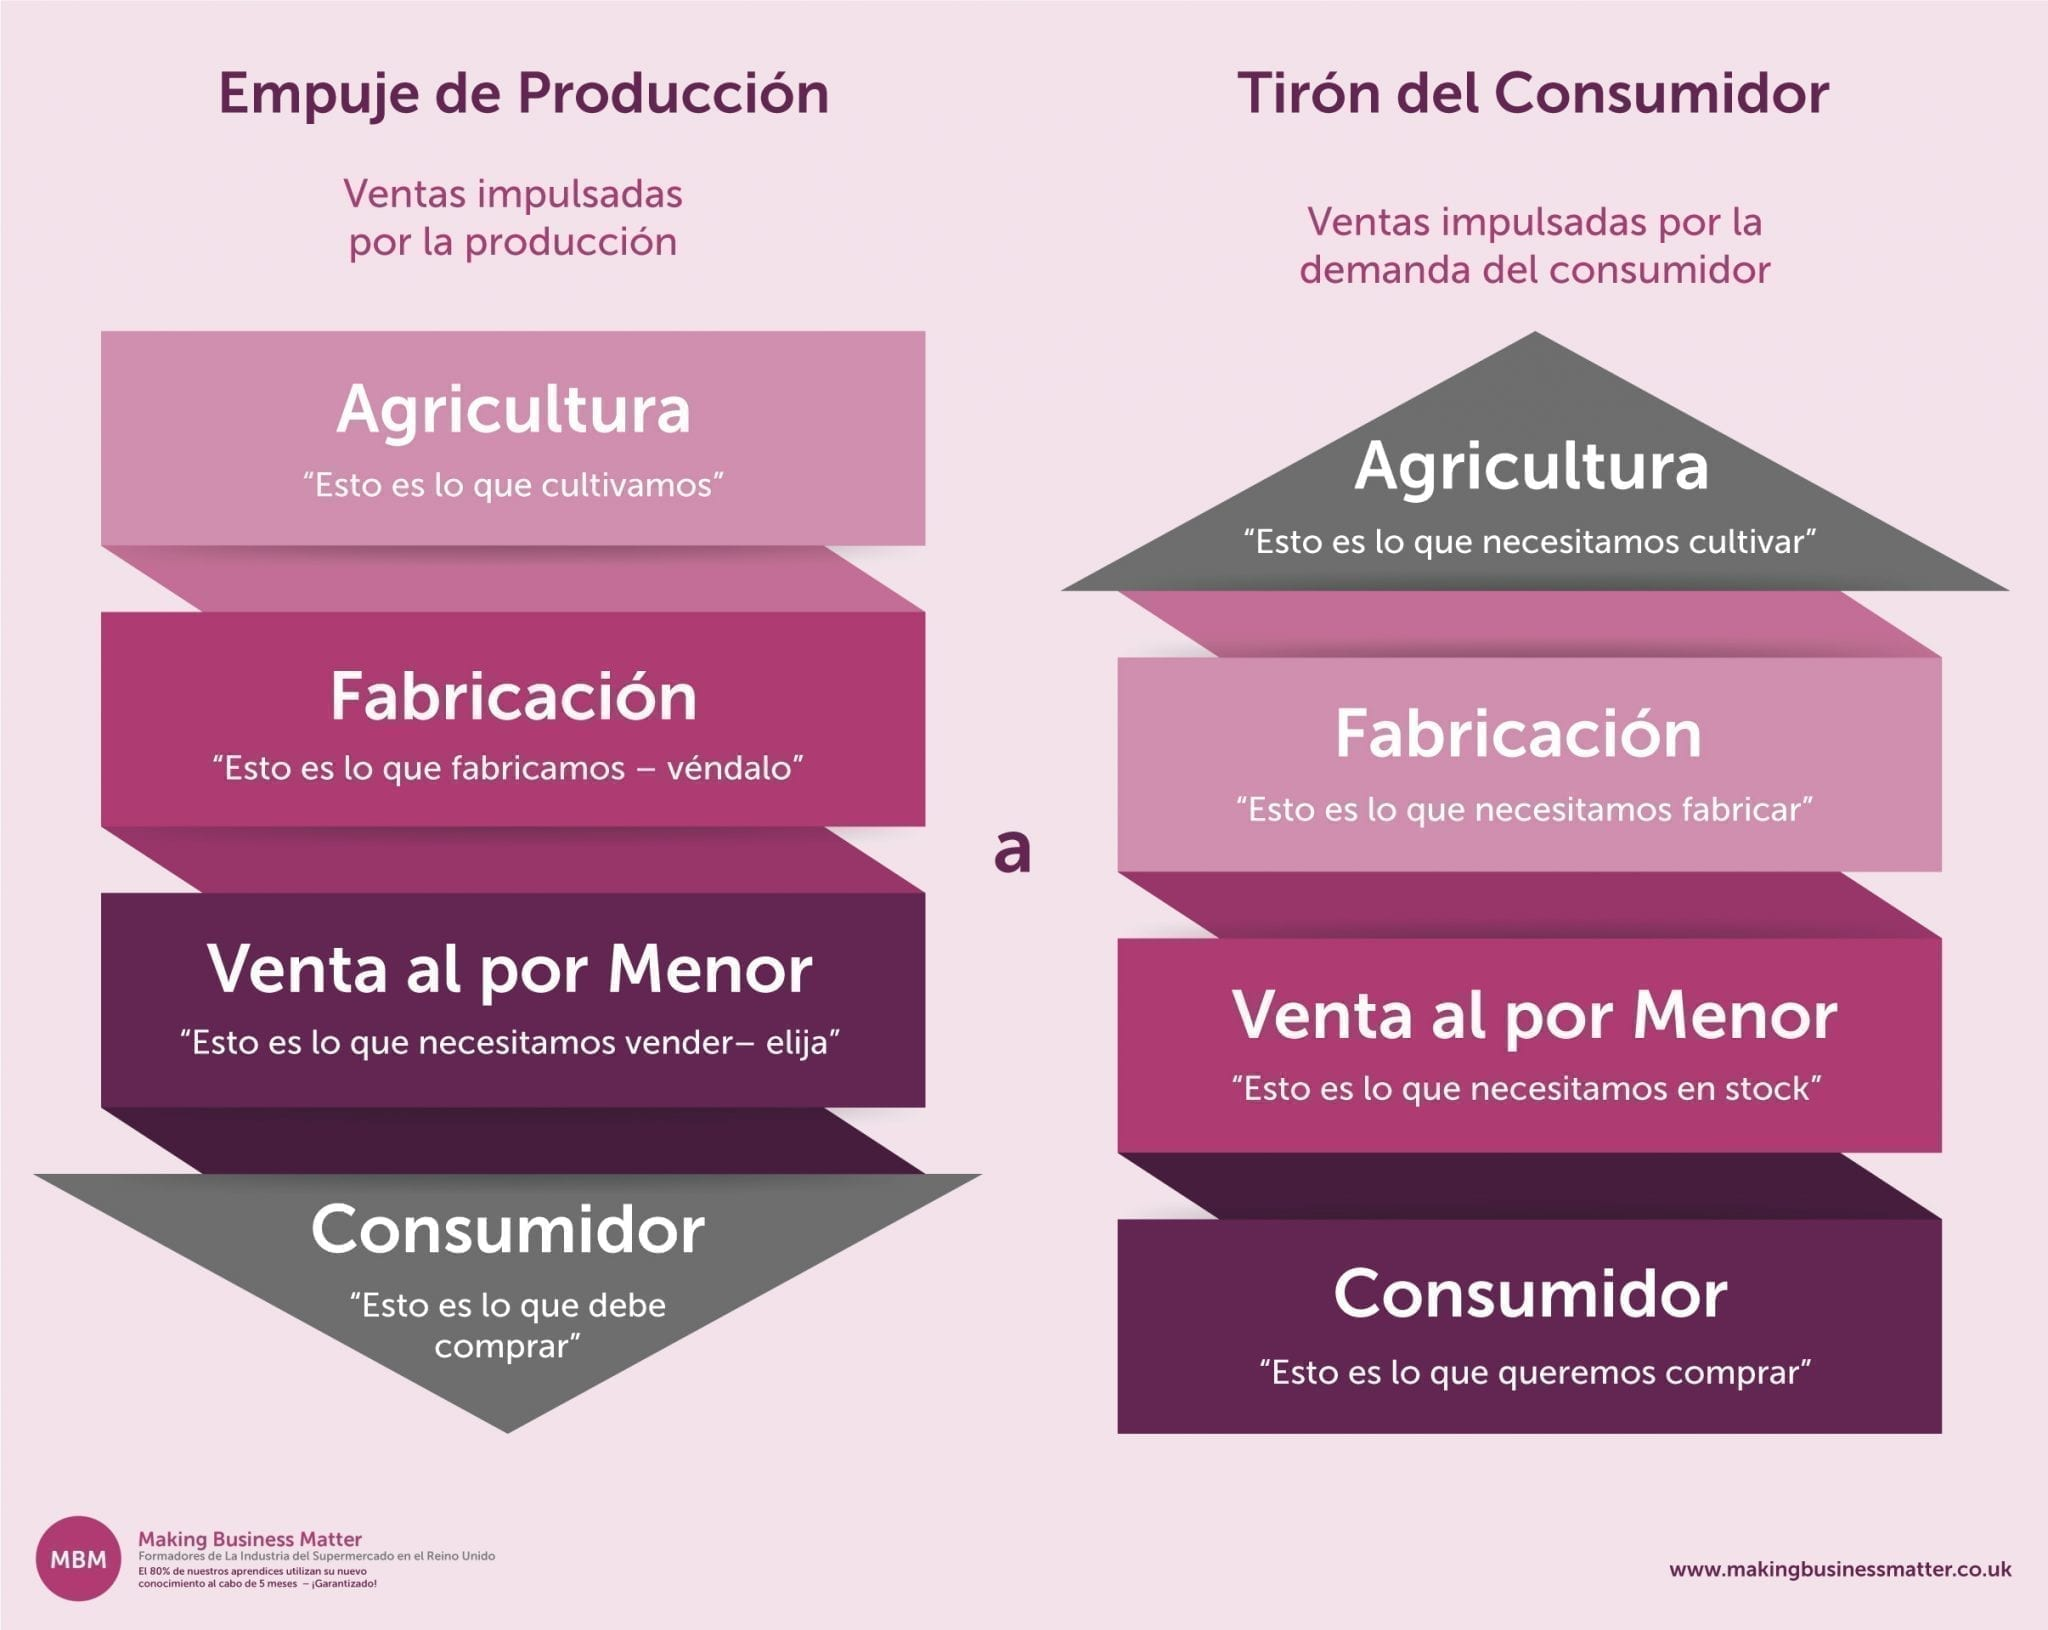 Empuje de Produccion vs. Tiron del Consumidor